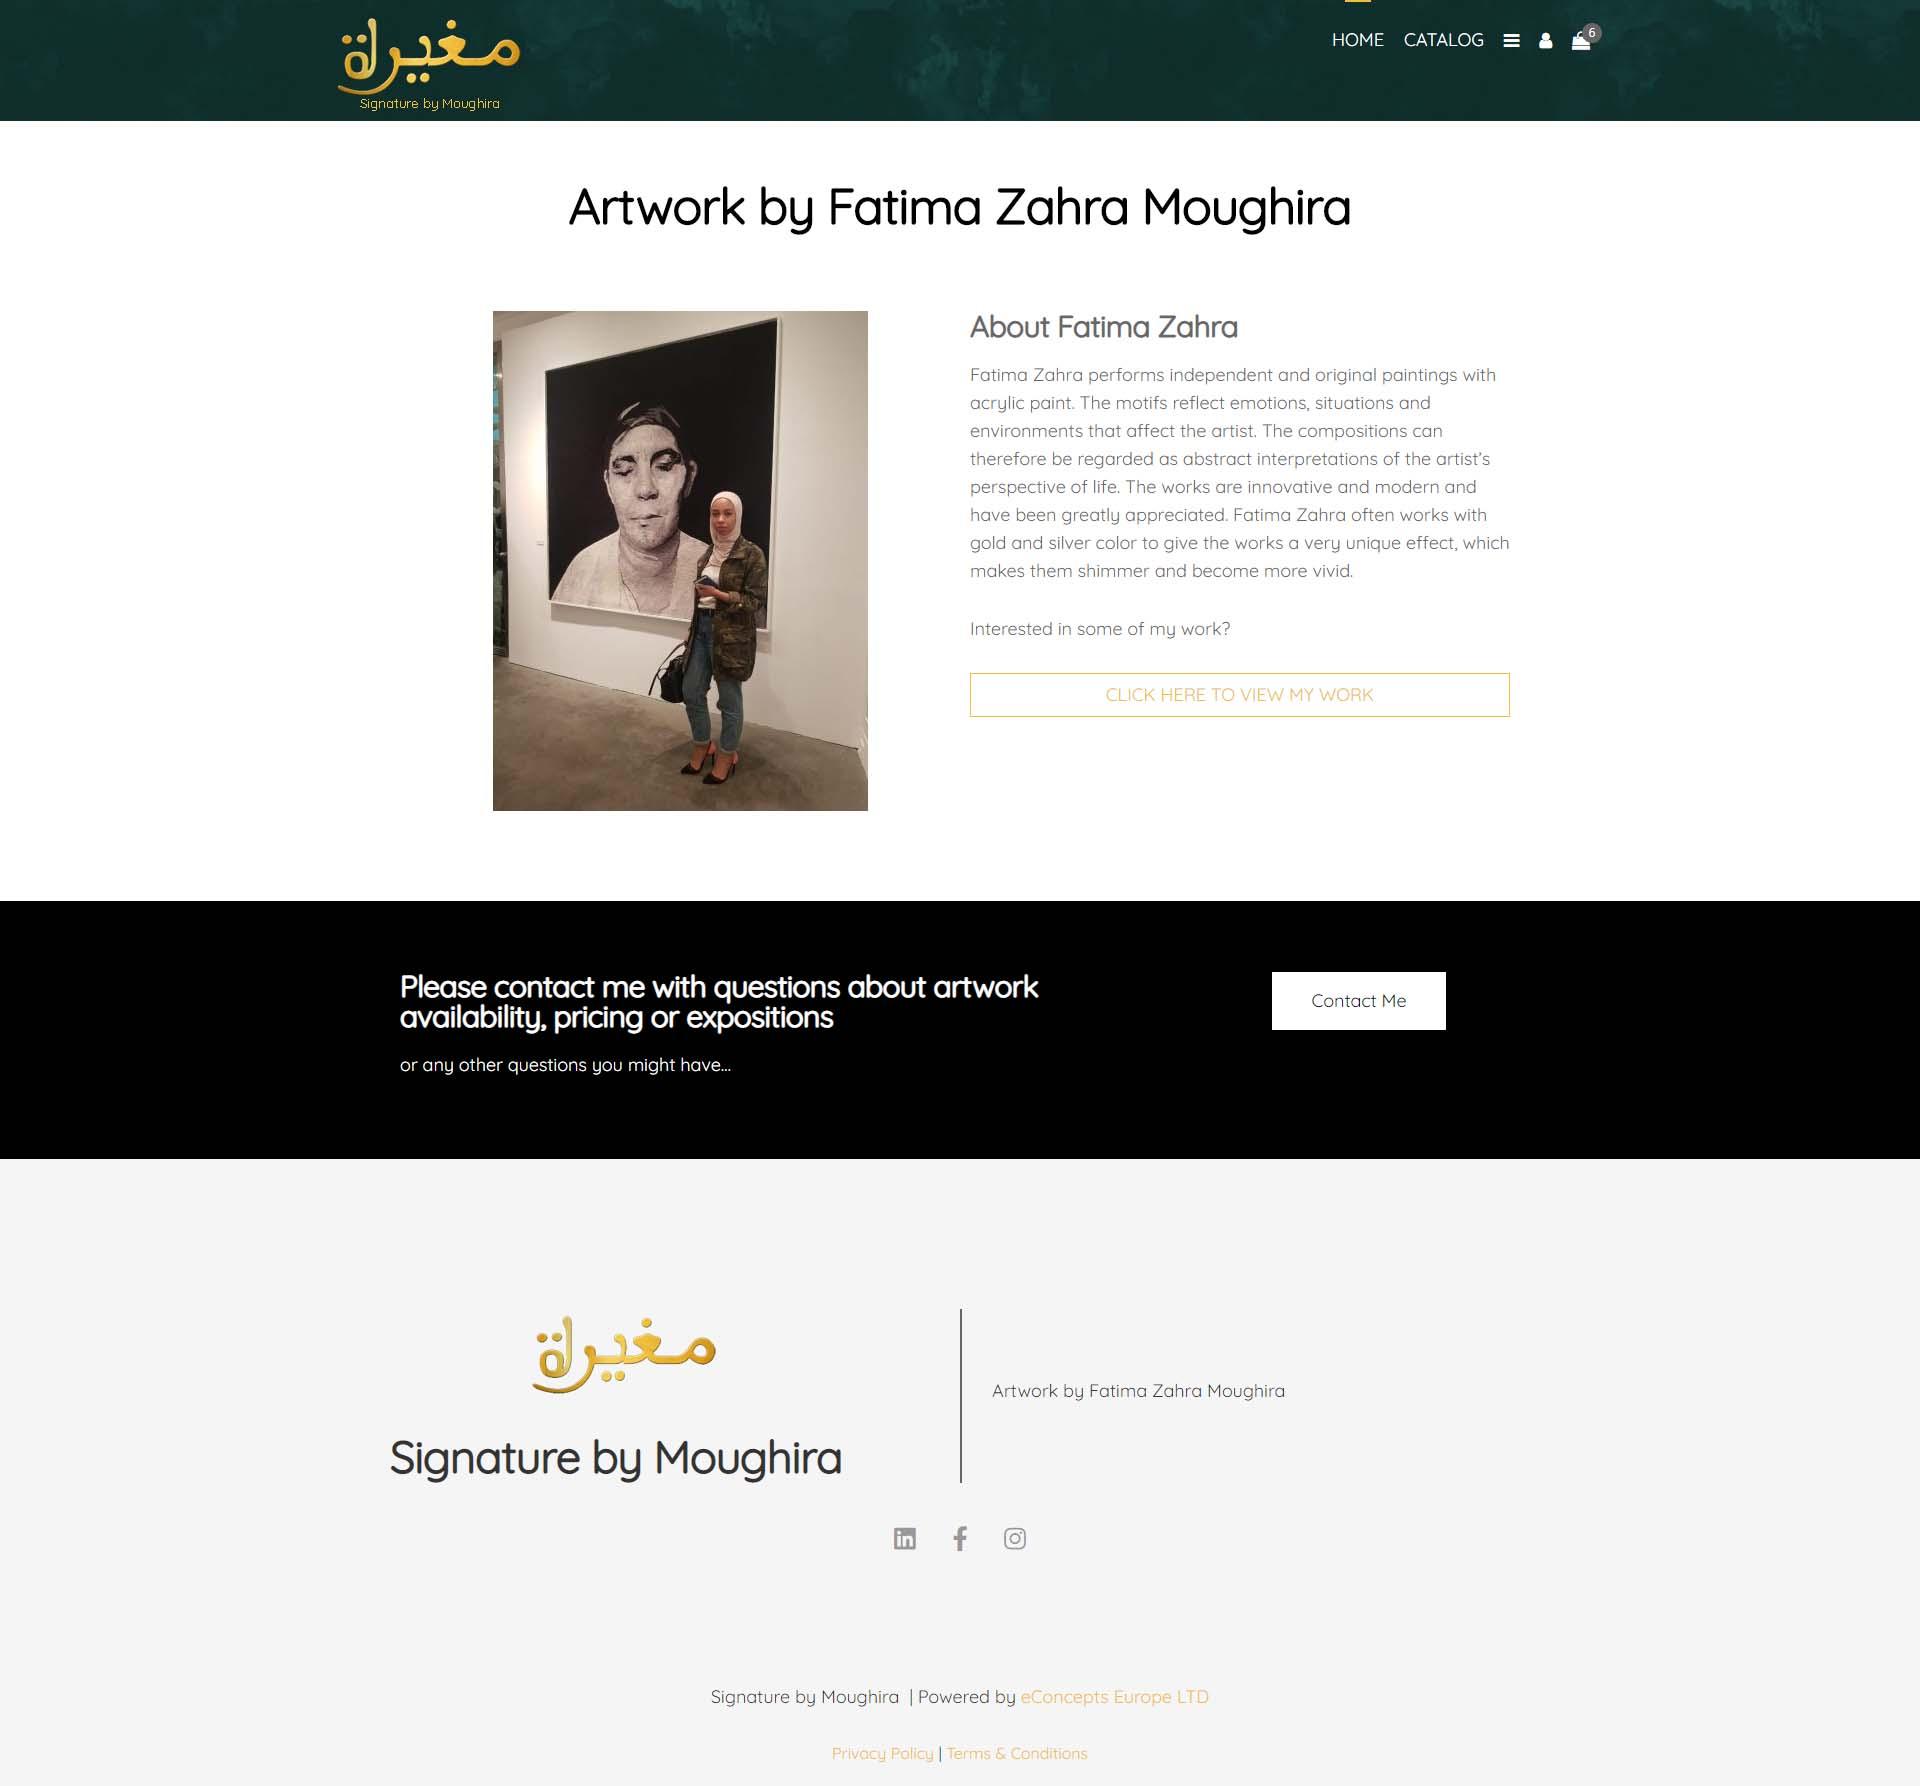 art webshop Signature by Moughira